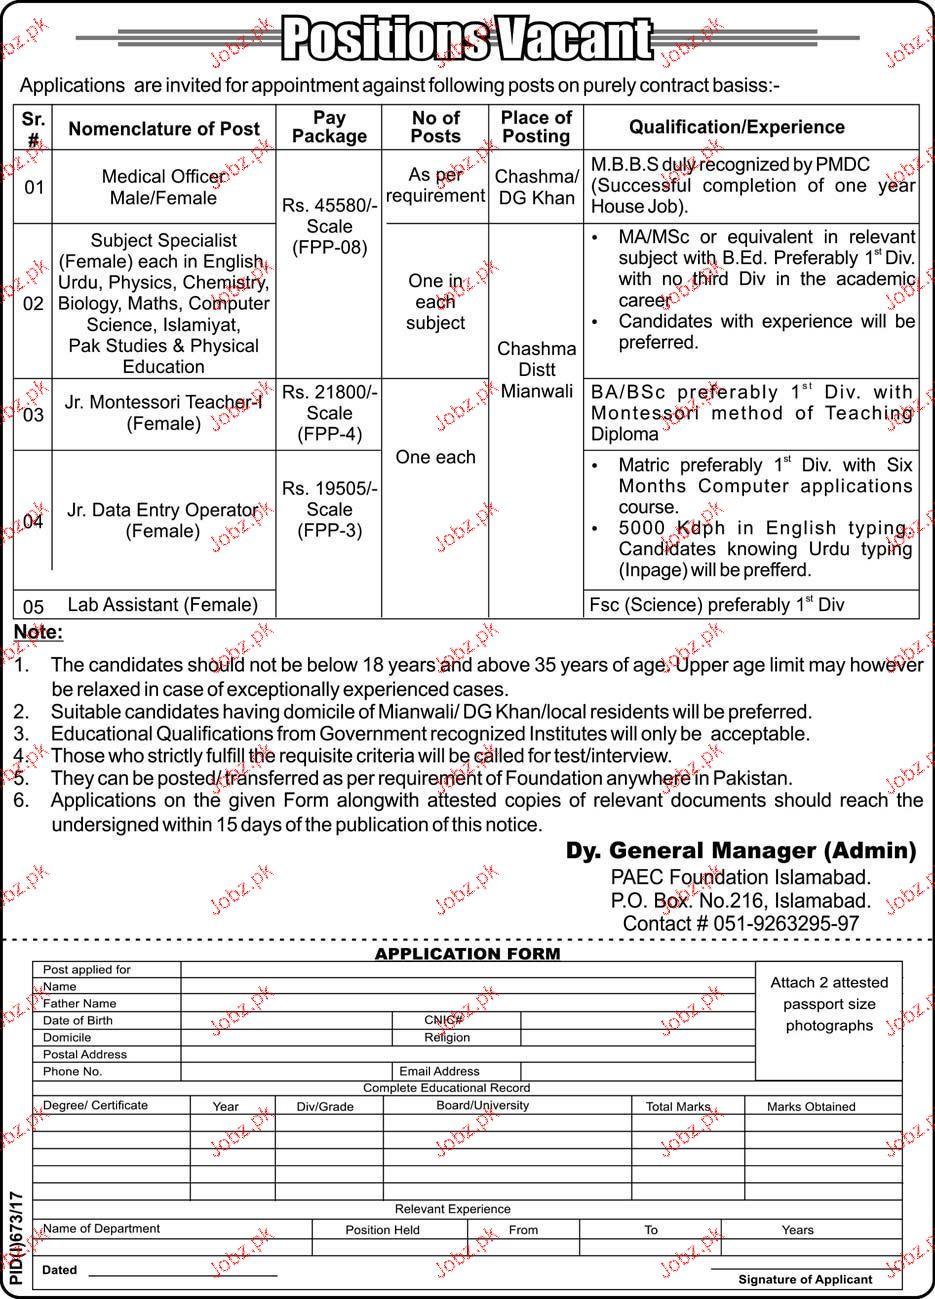 PAEC Foundation Islamabad Jobs